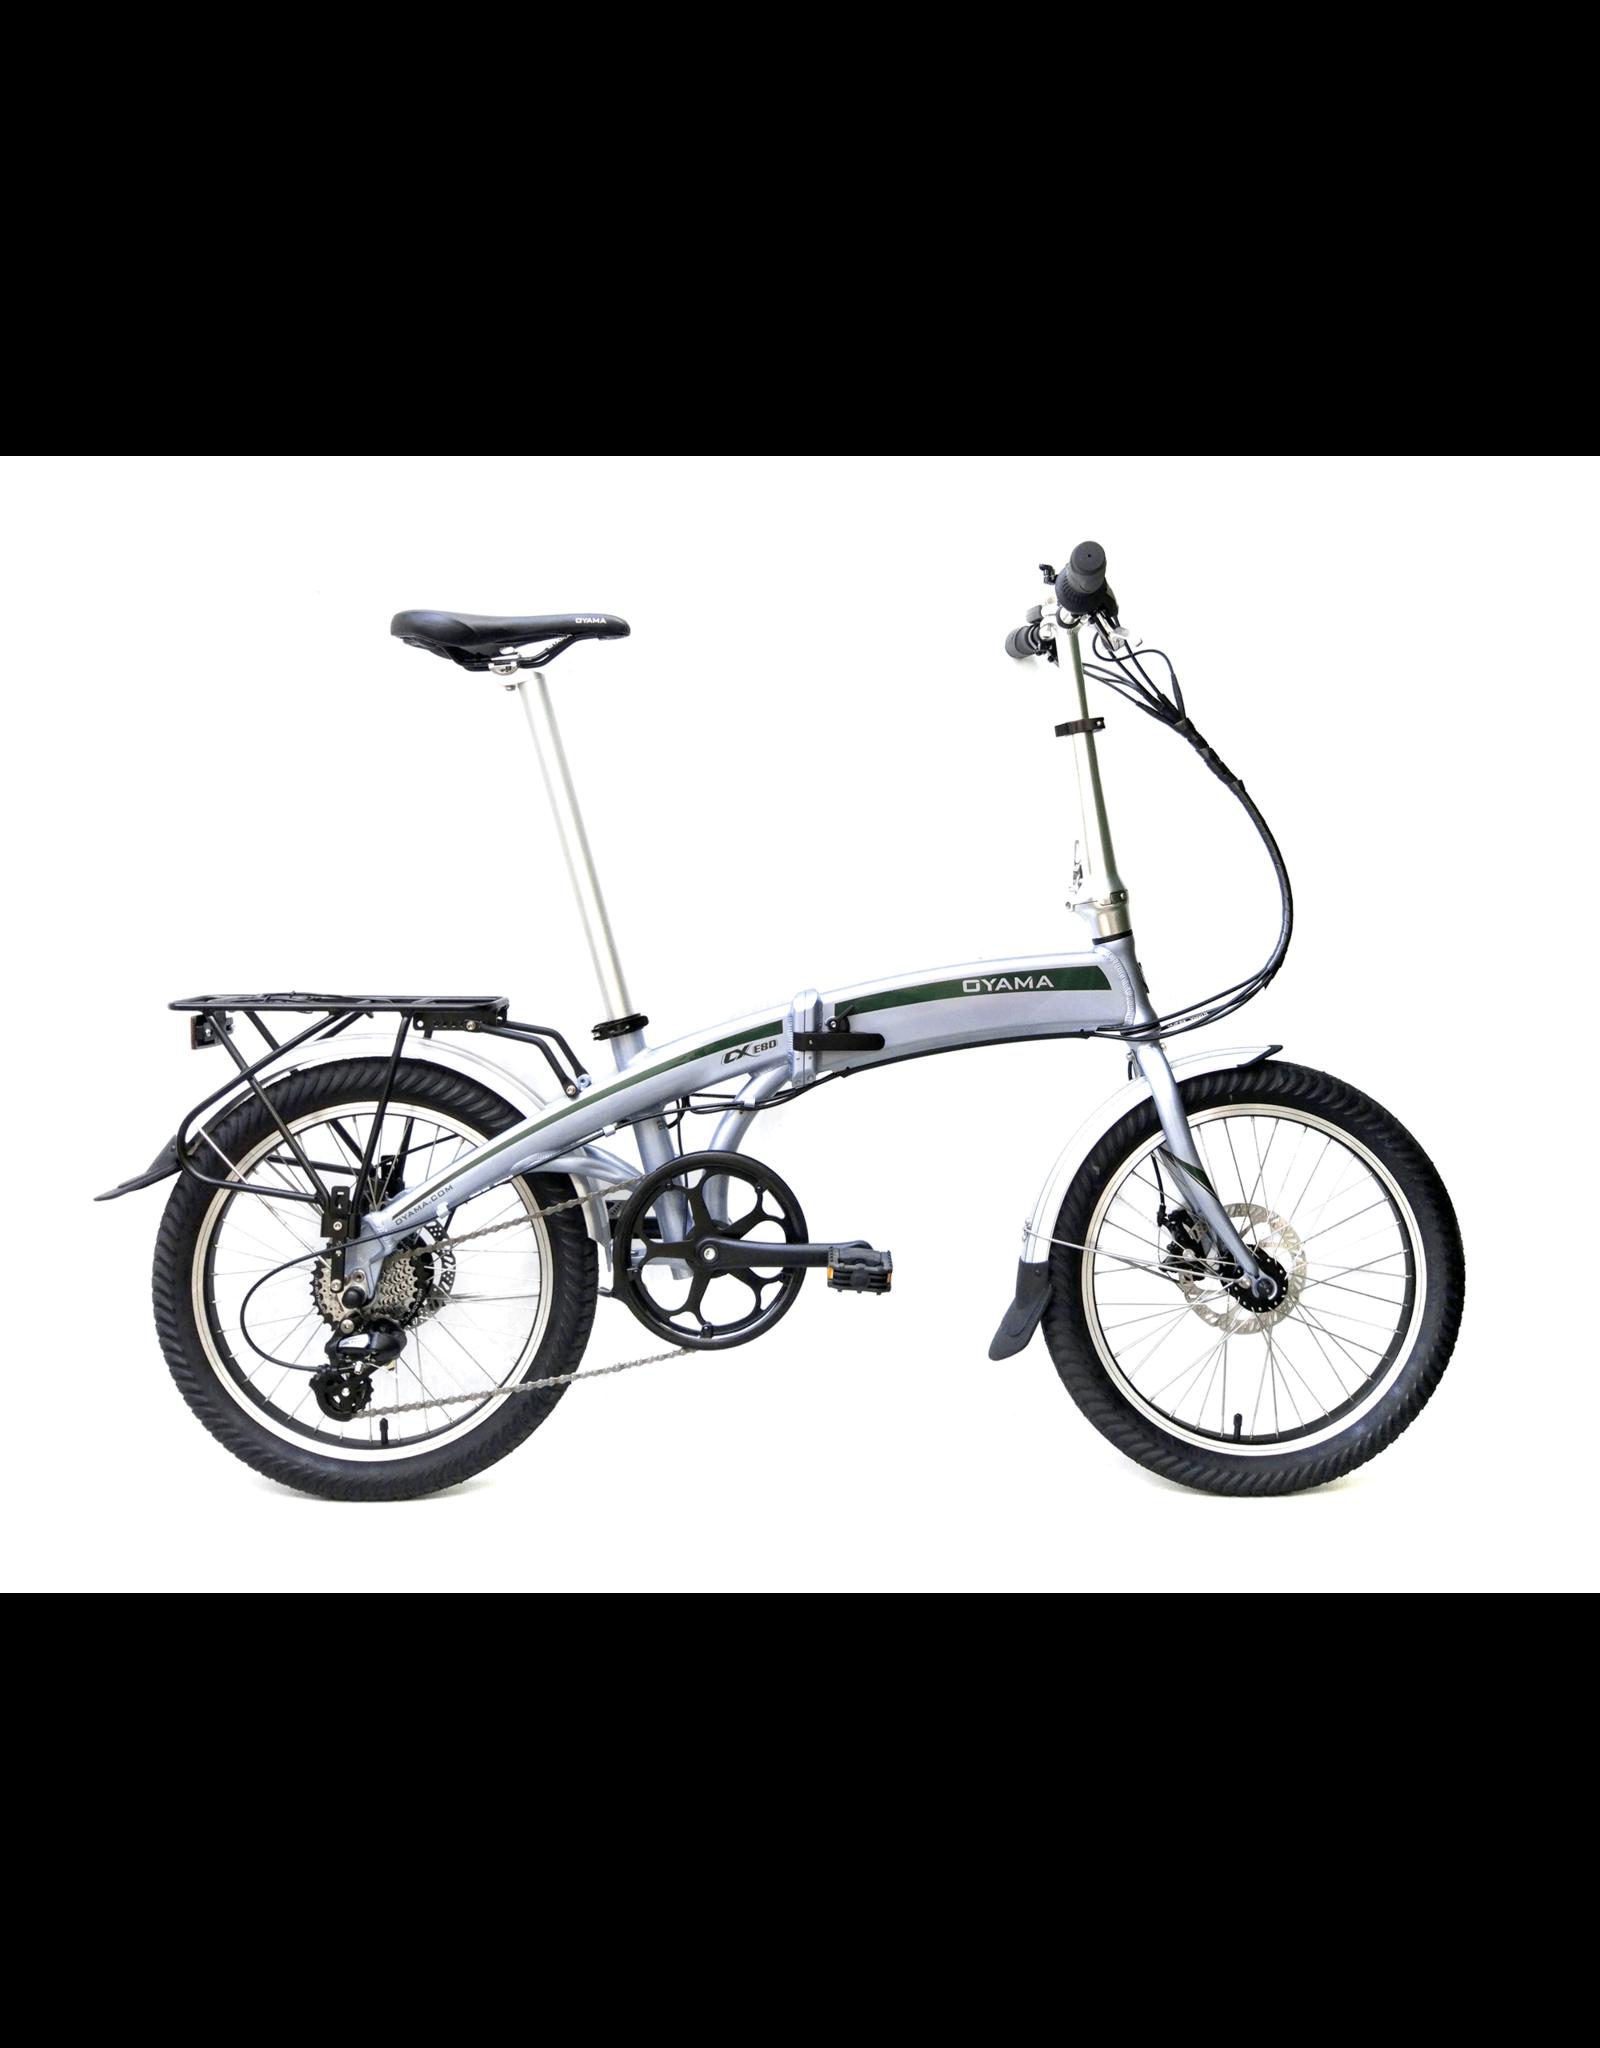 "Oyama Oyama CX E8D 20"" Electric Folding Bicycle"